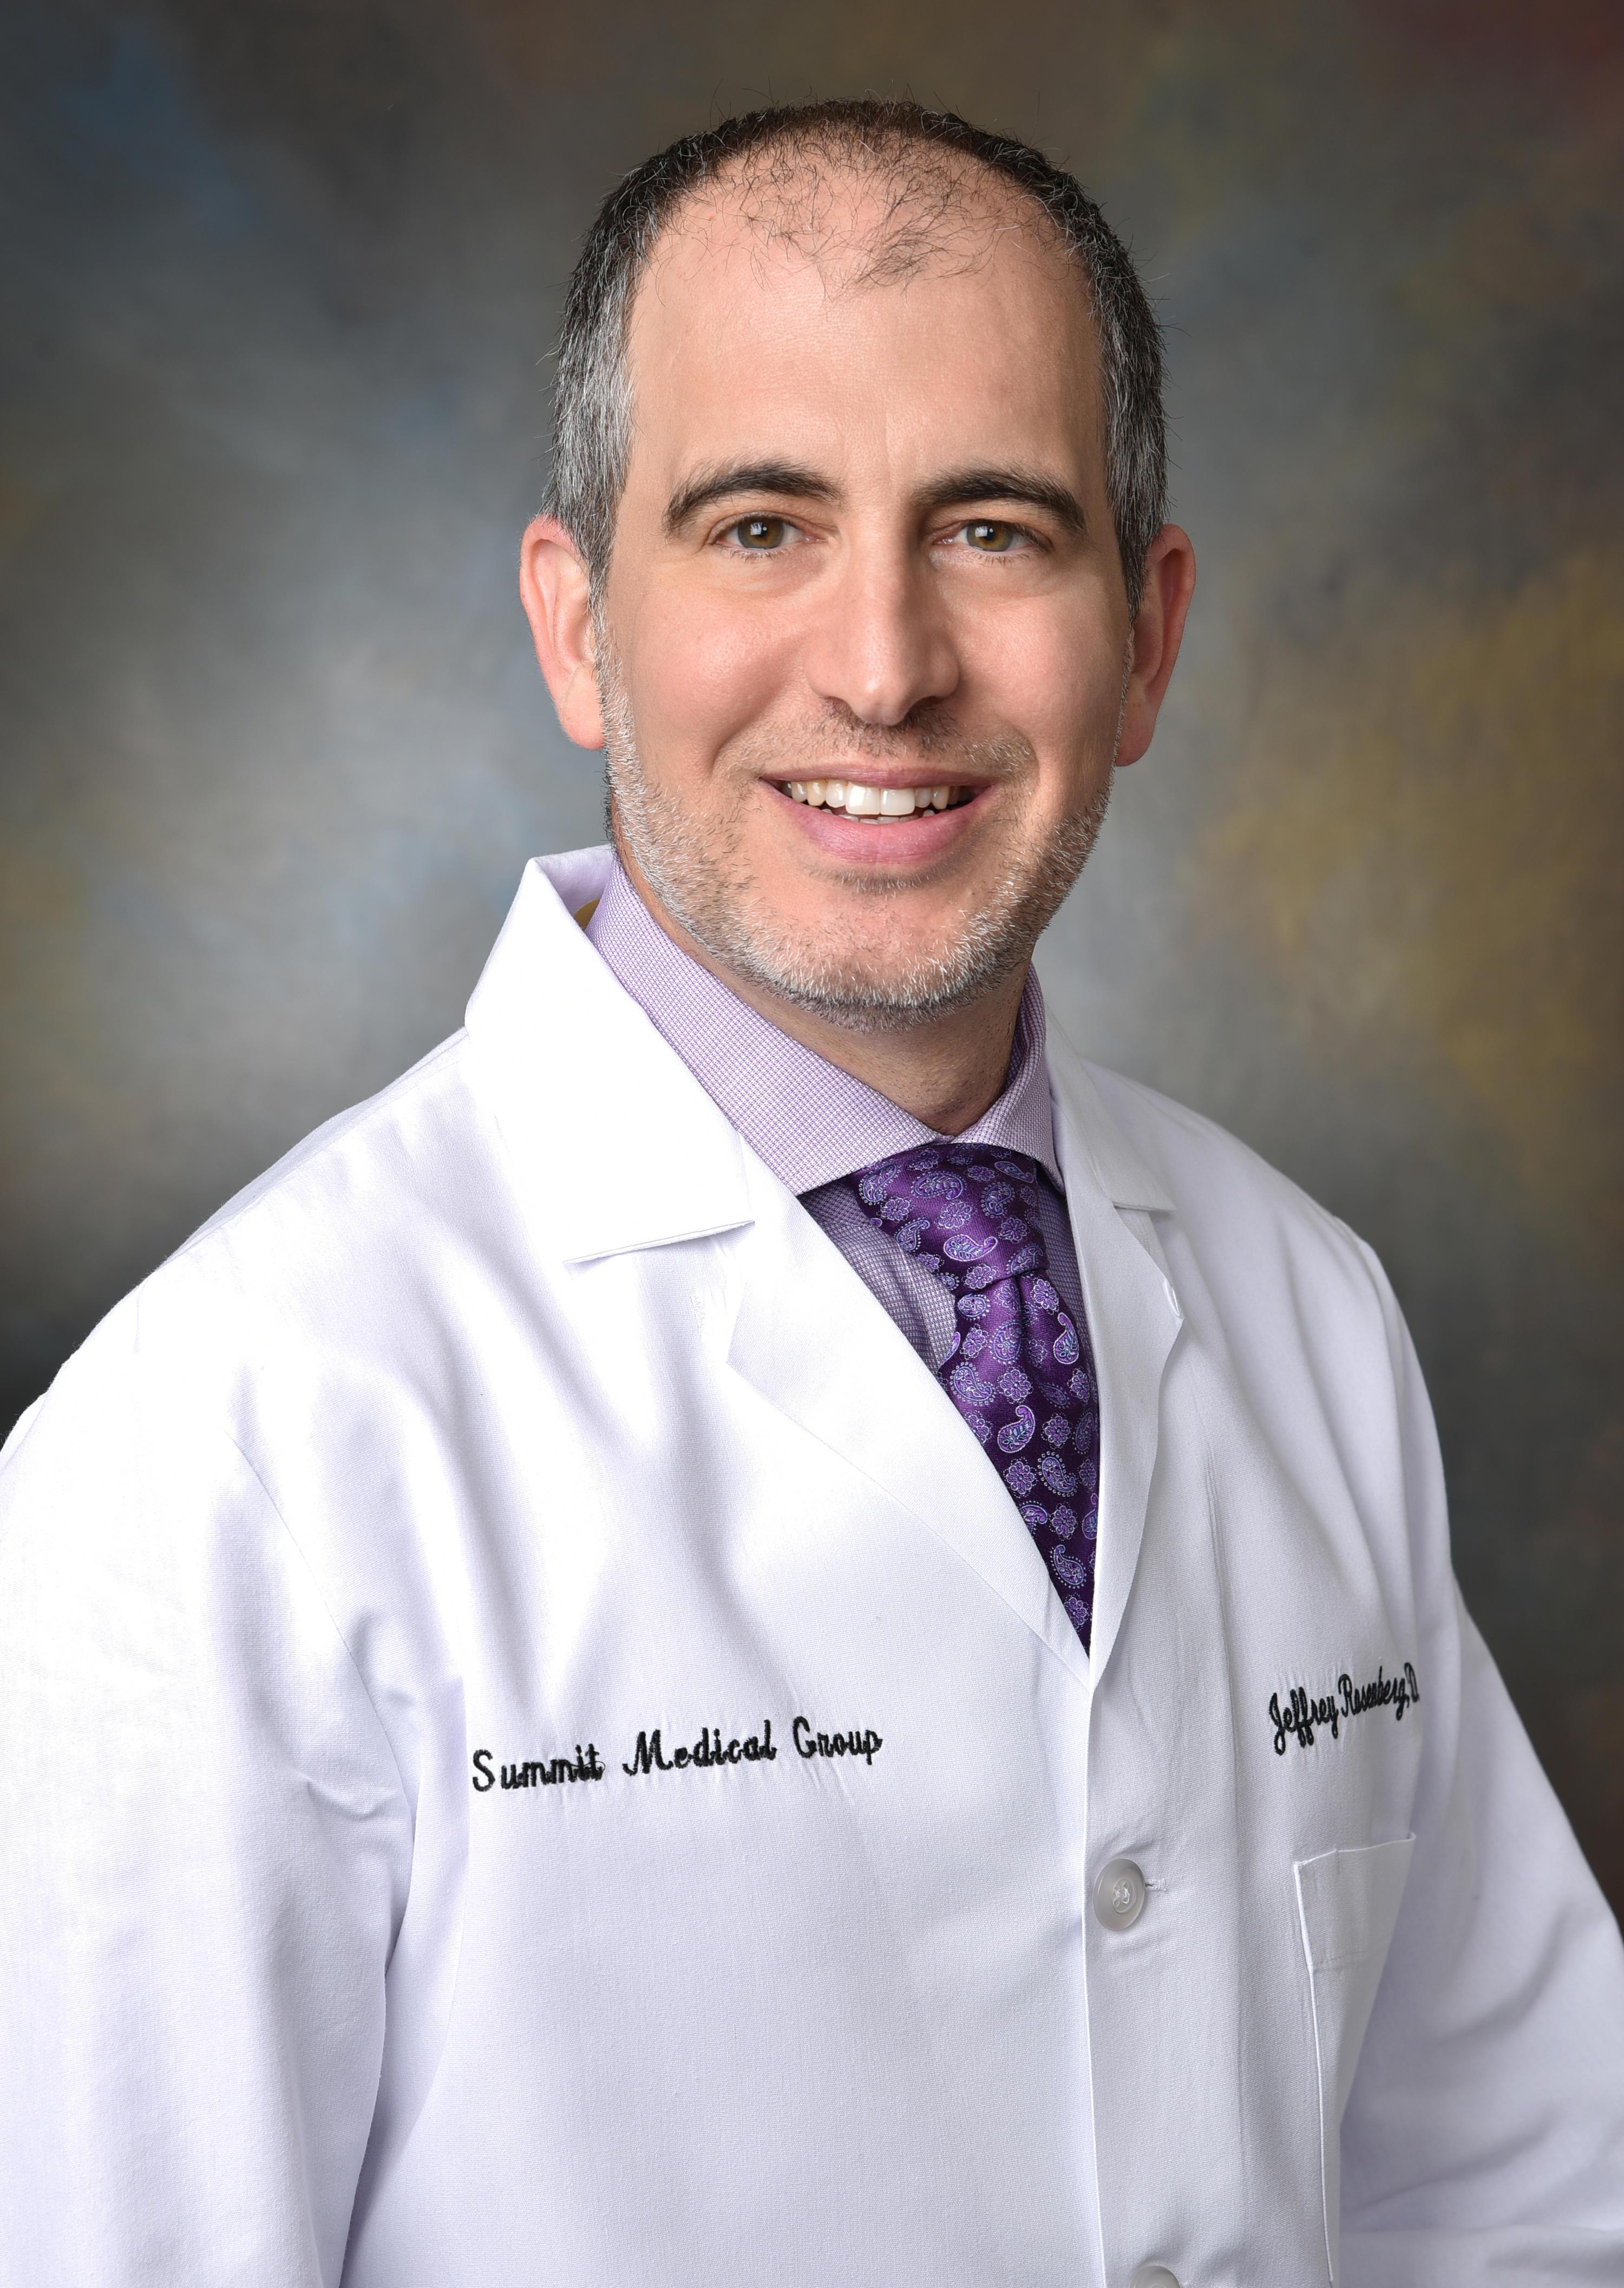 Jeffrey Rosenberg MD